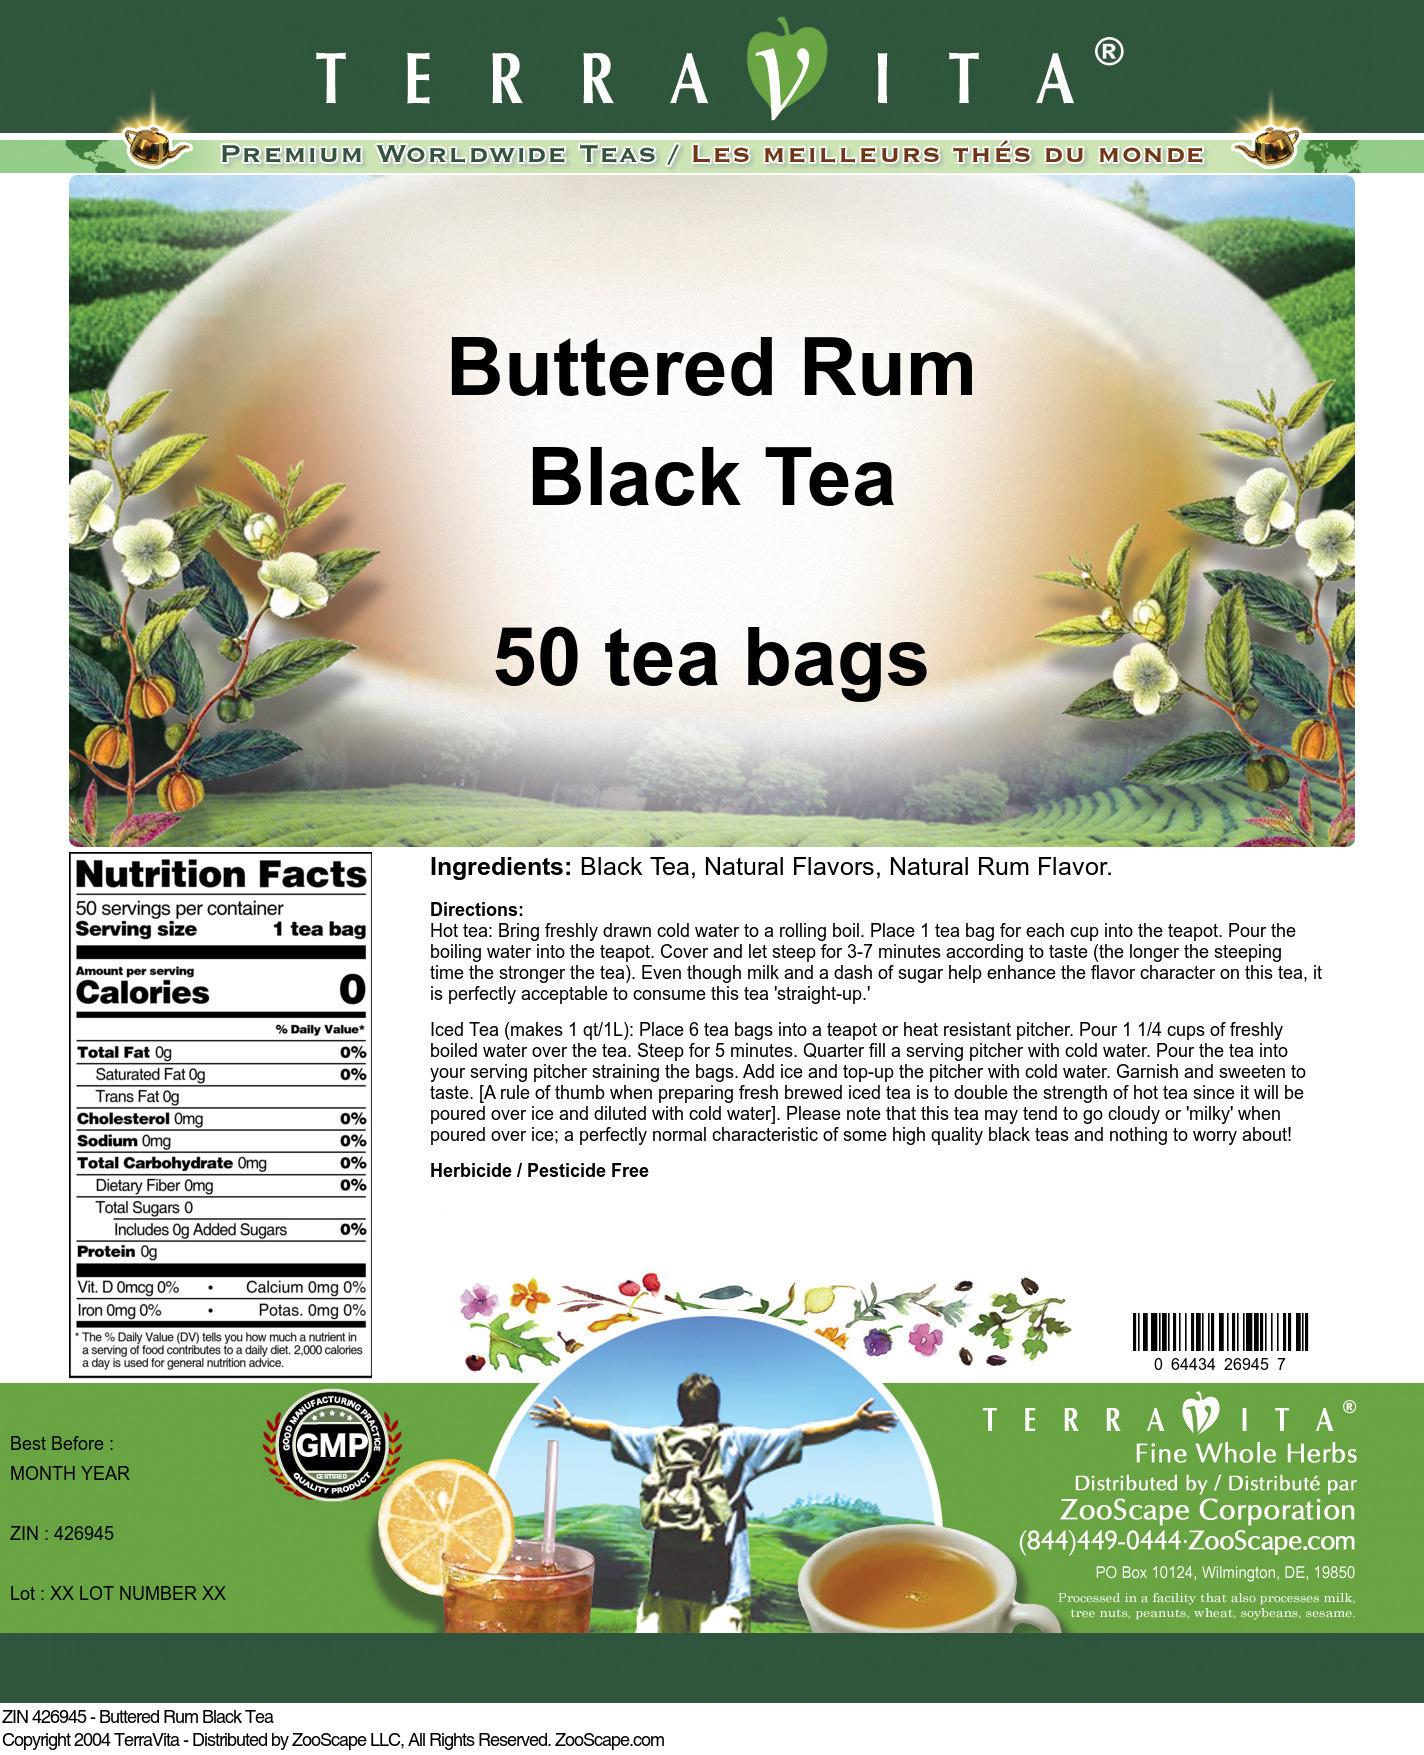 Buttered Rum Black Tea